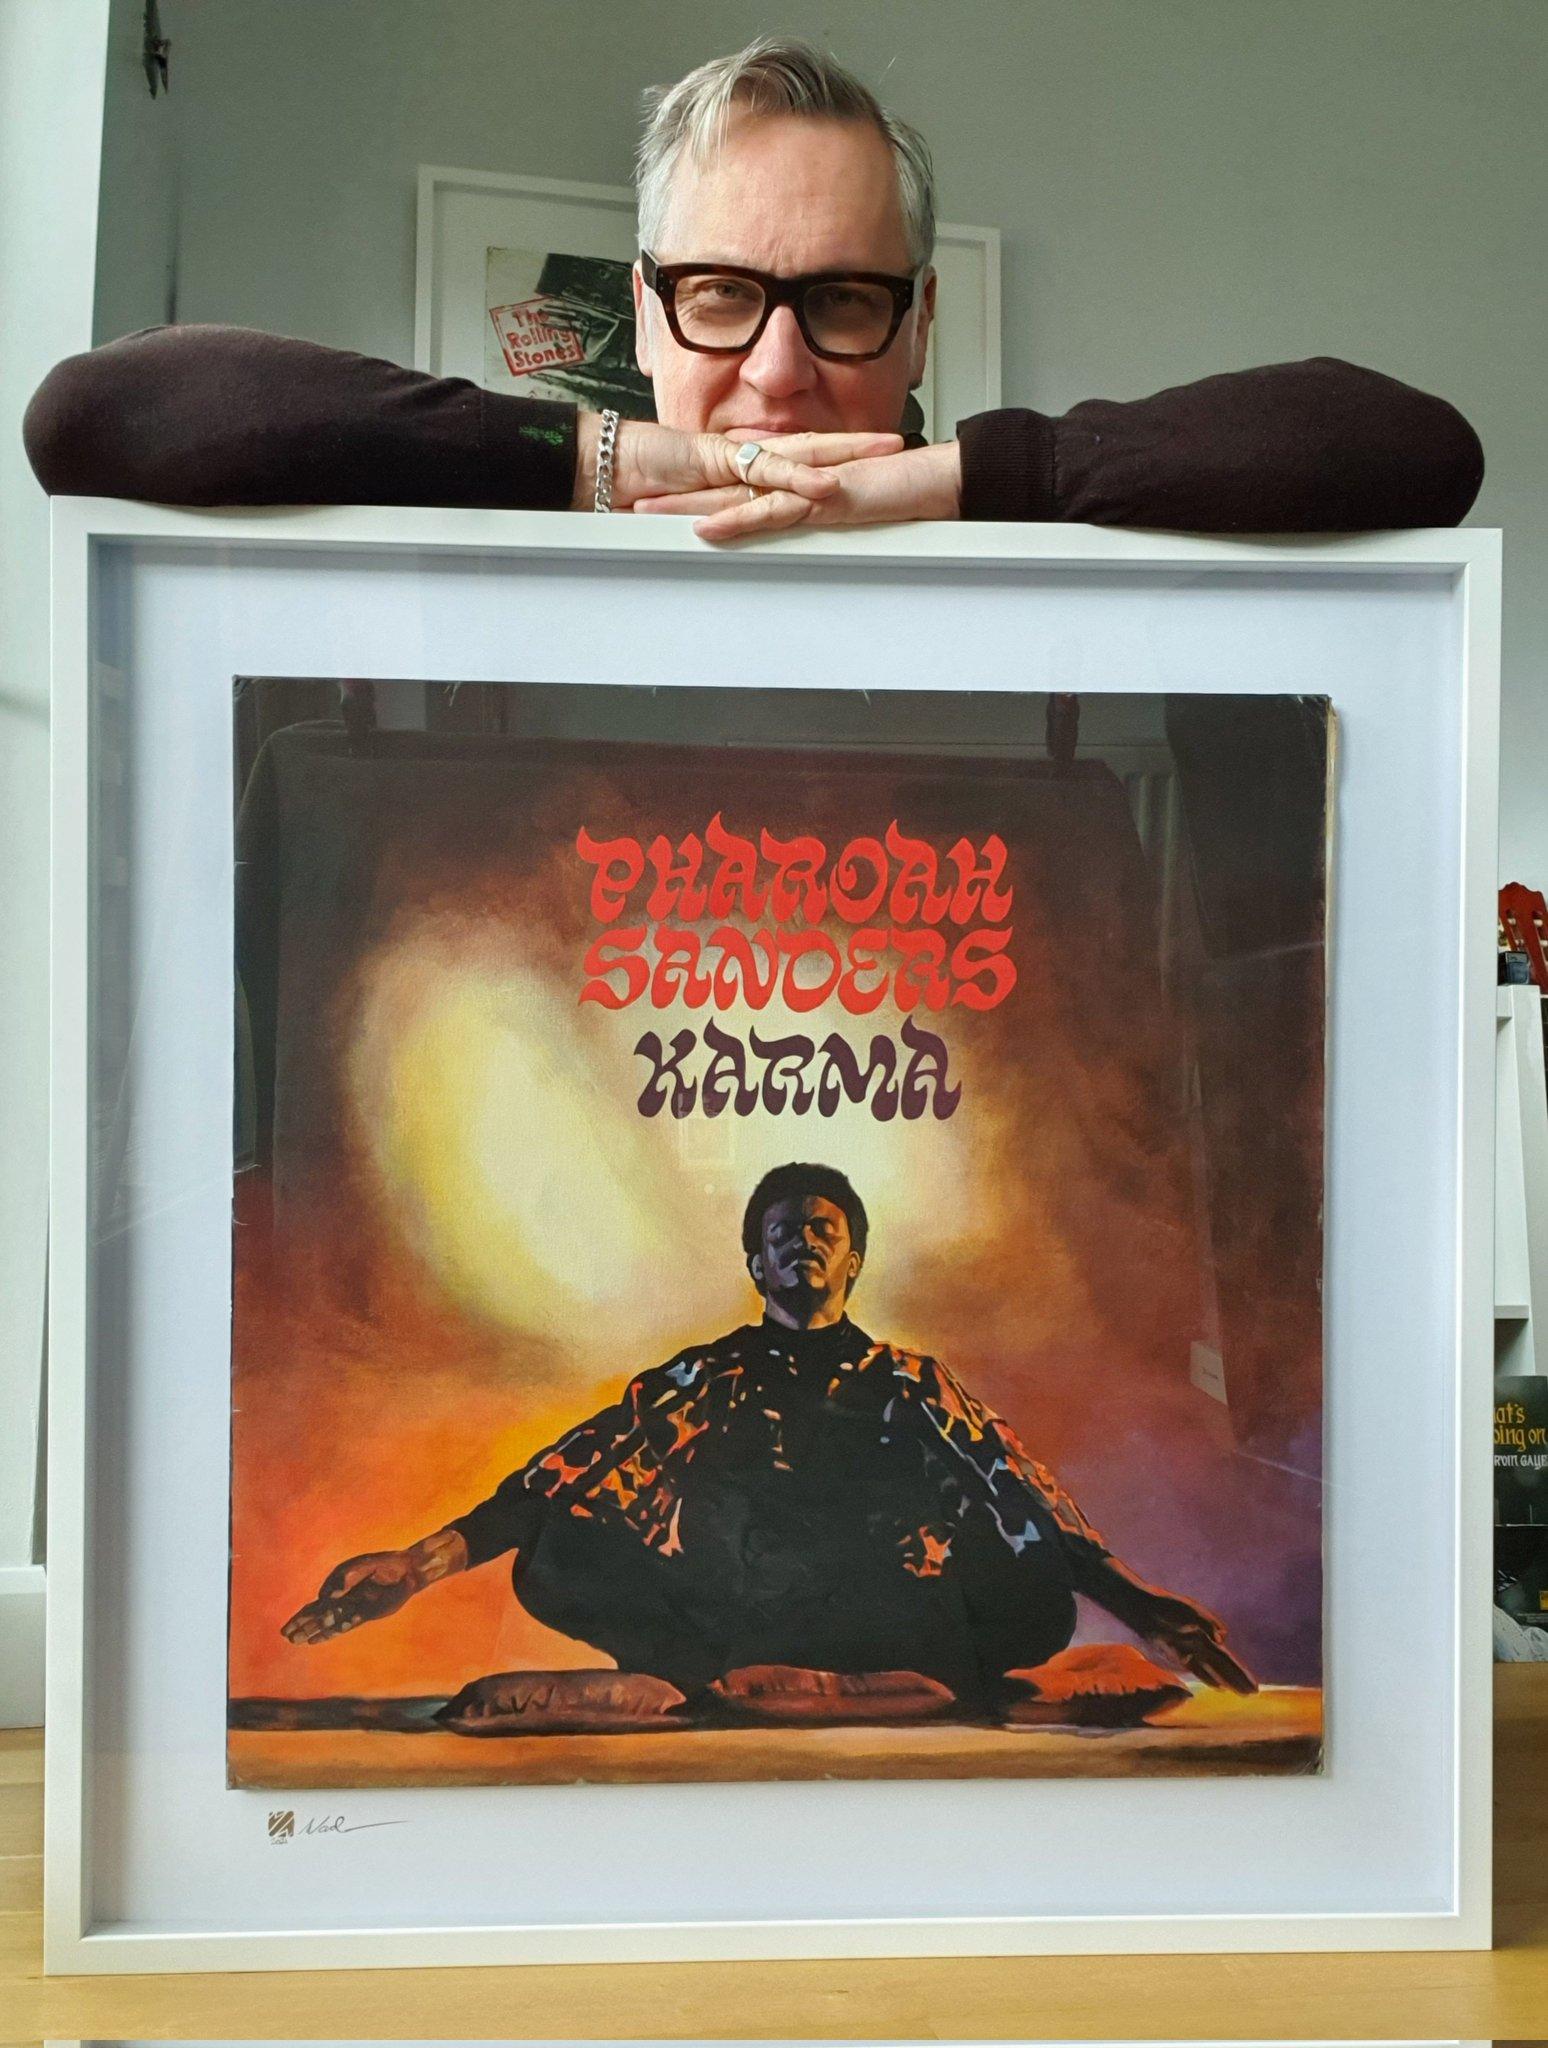 Happy 81st birthday to the great Pharoah Sanders. Saxophonist extraordinaire.